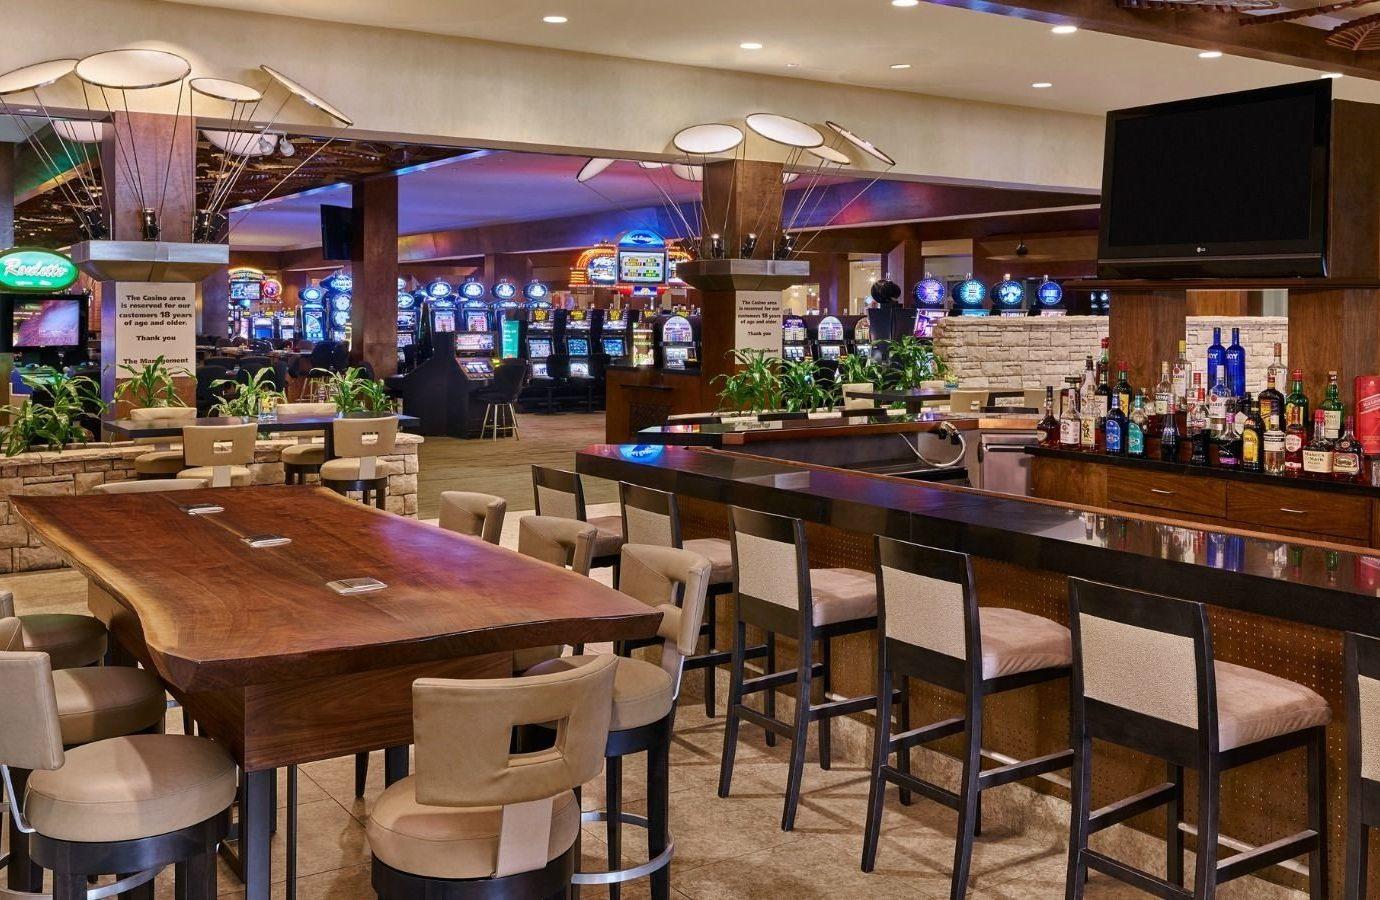 Hotels table indoor floor ceiling restaurant Bar interior design function hall café area Island furniture